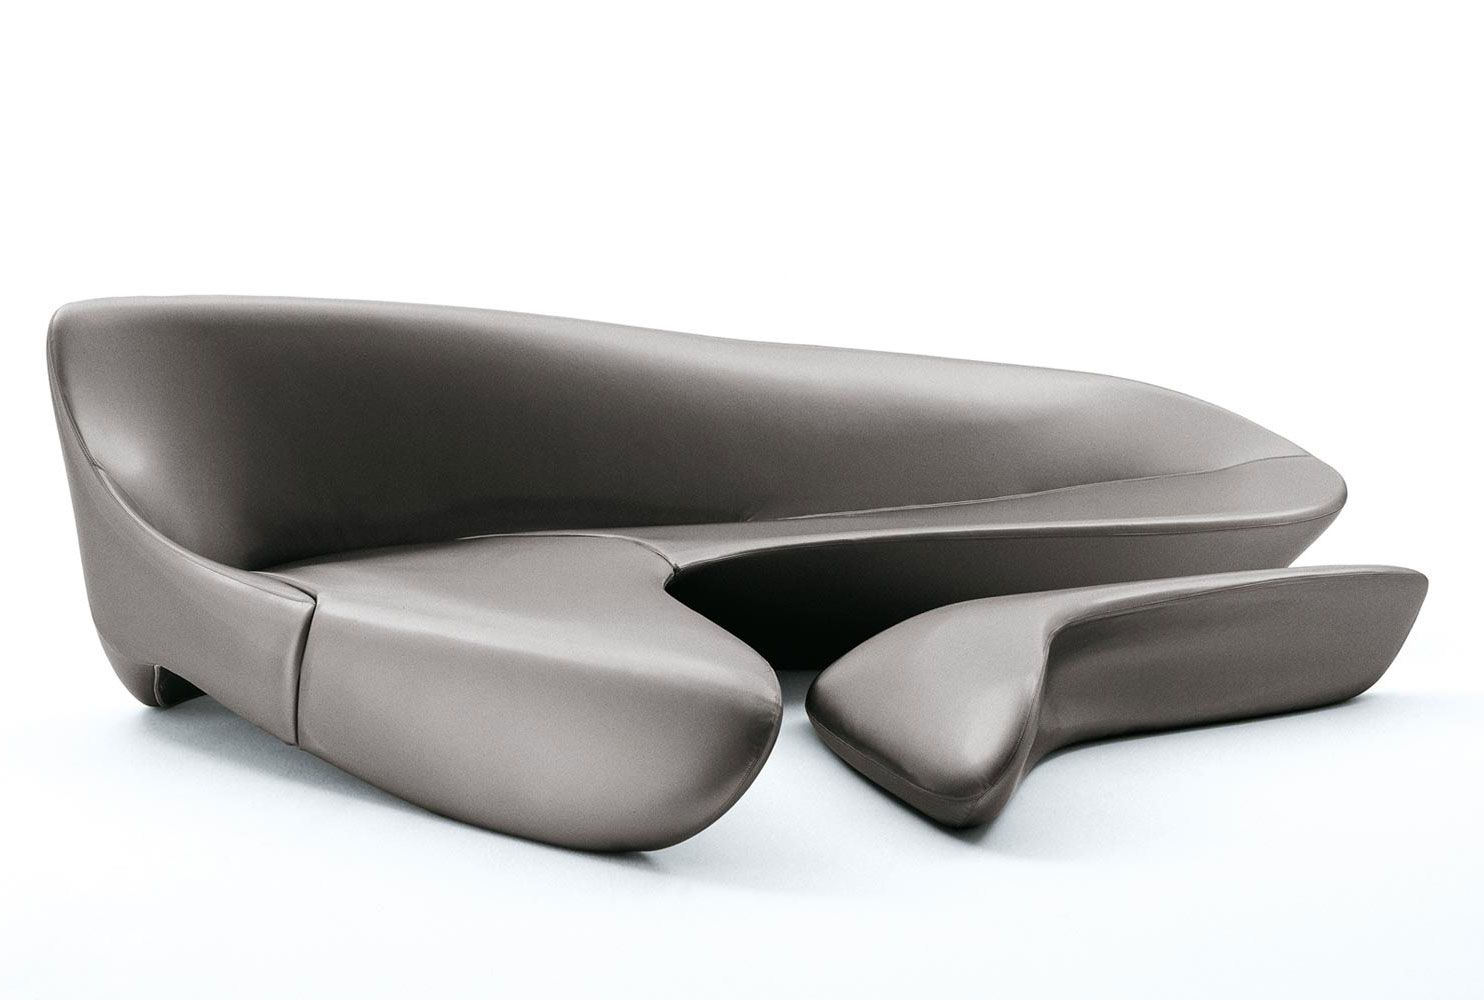 Sofa moon system collection b b italia design zaha for B et b italia